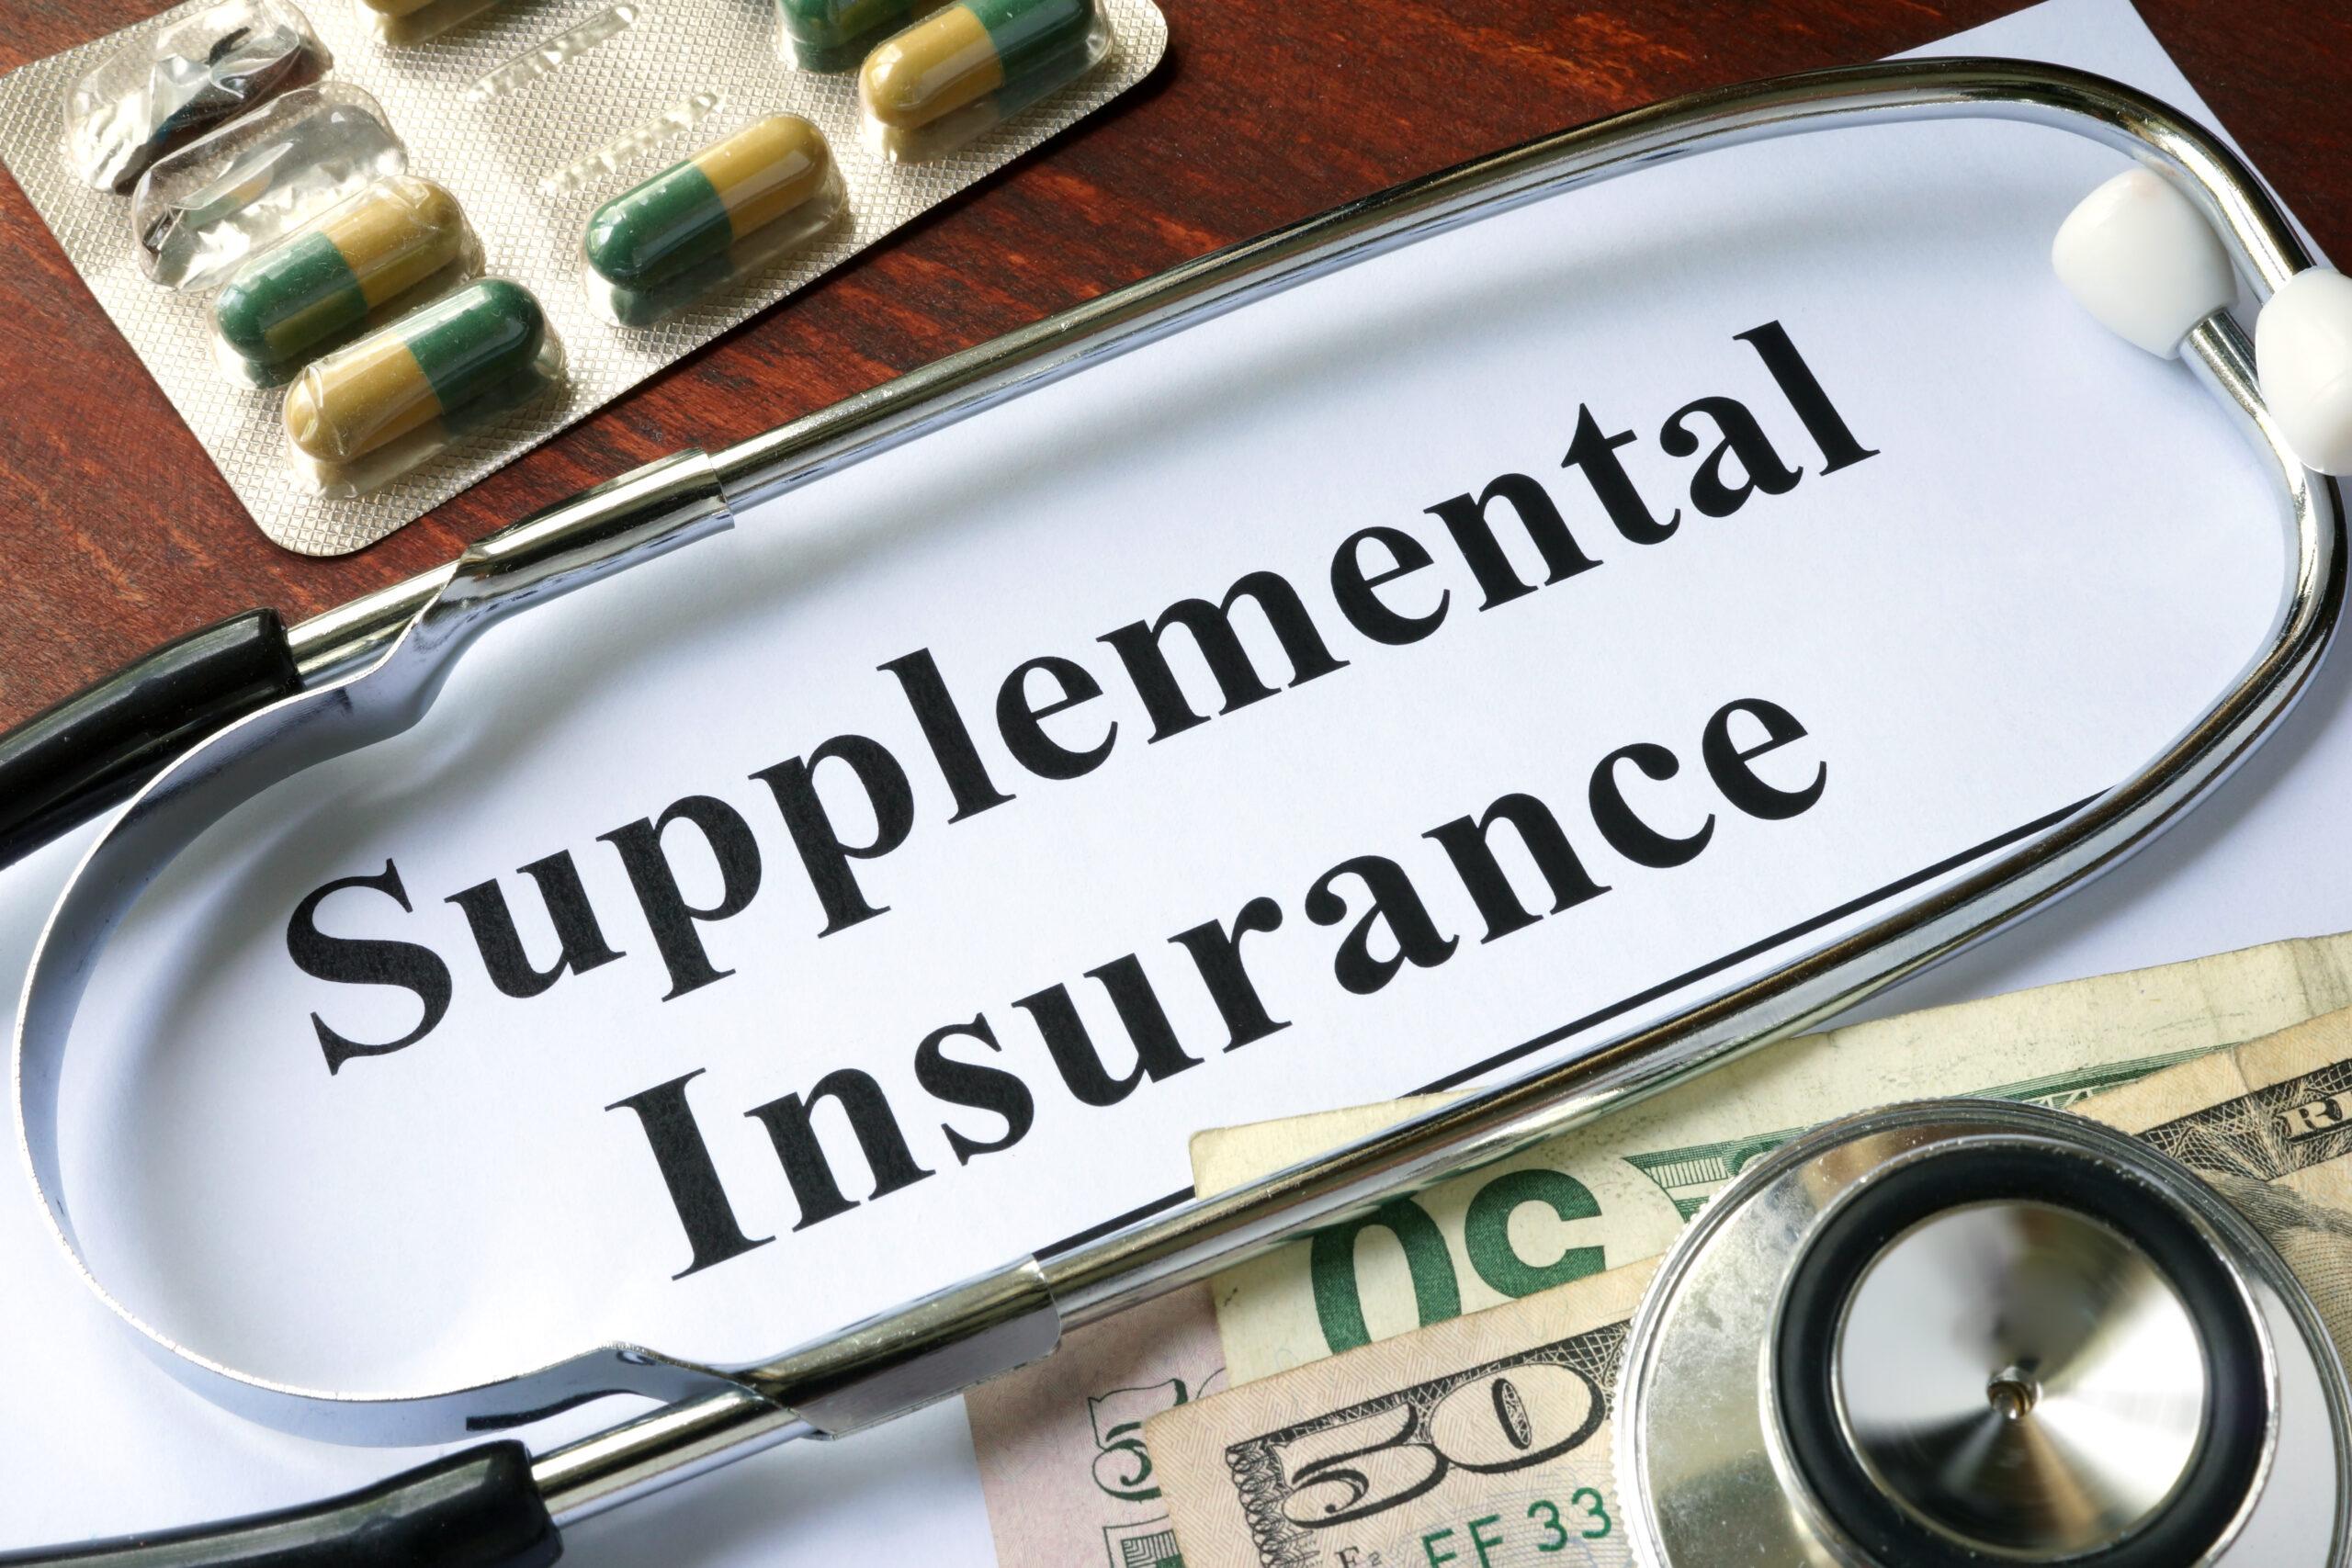 Supplemental life insurance documents